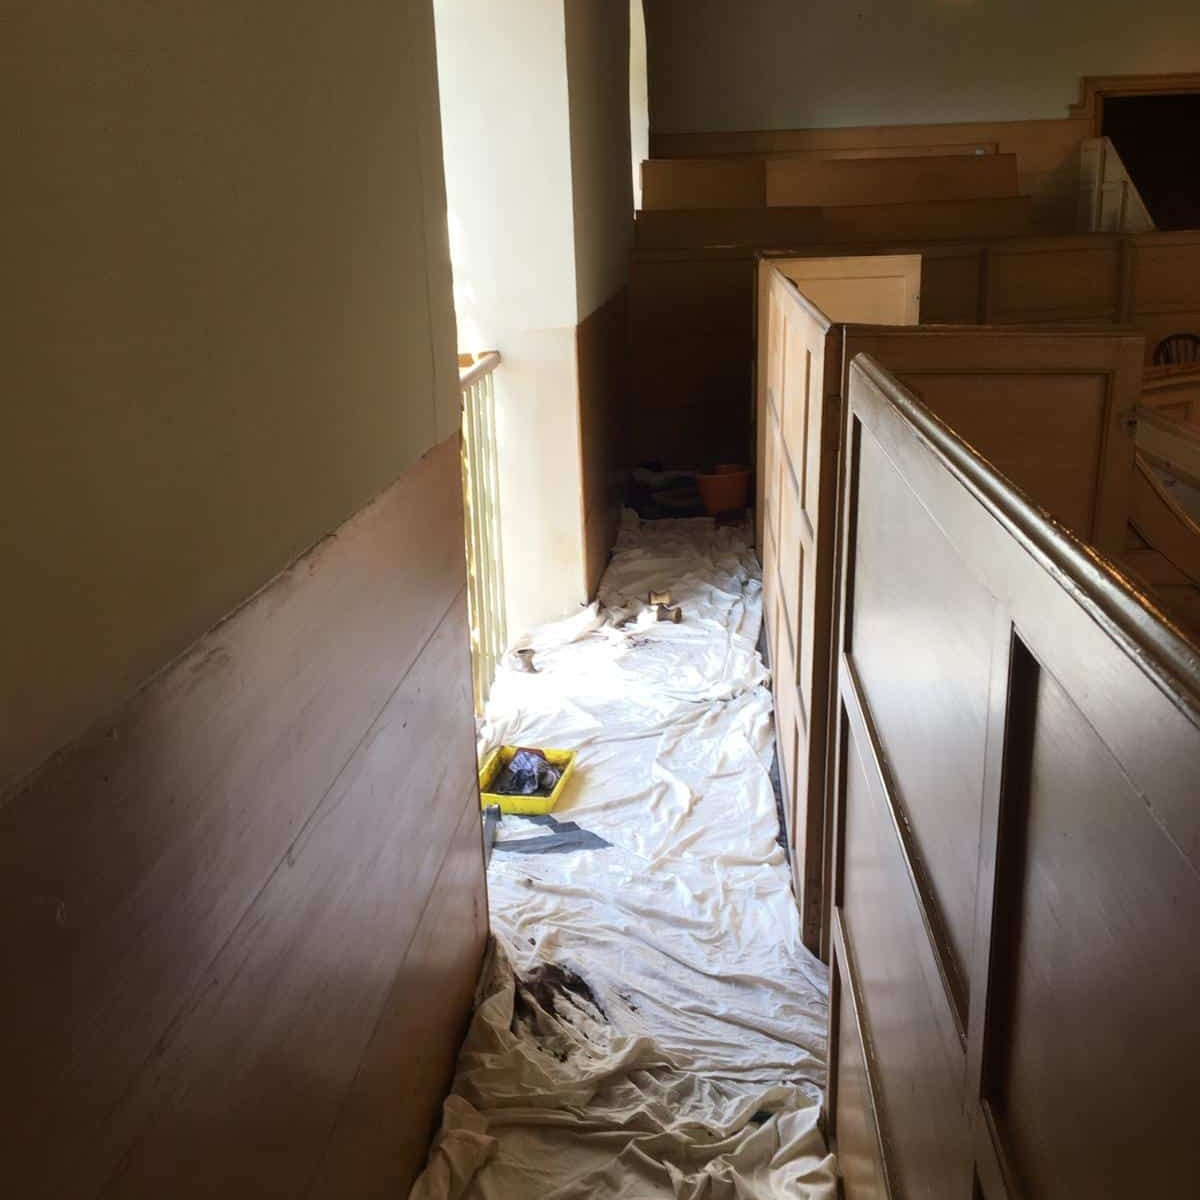 Photos from Bishopton Parish Church heating system 23